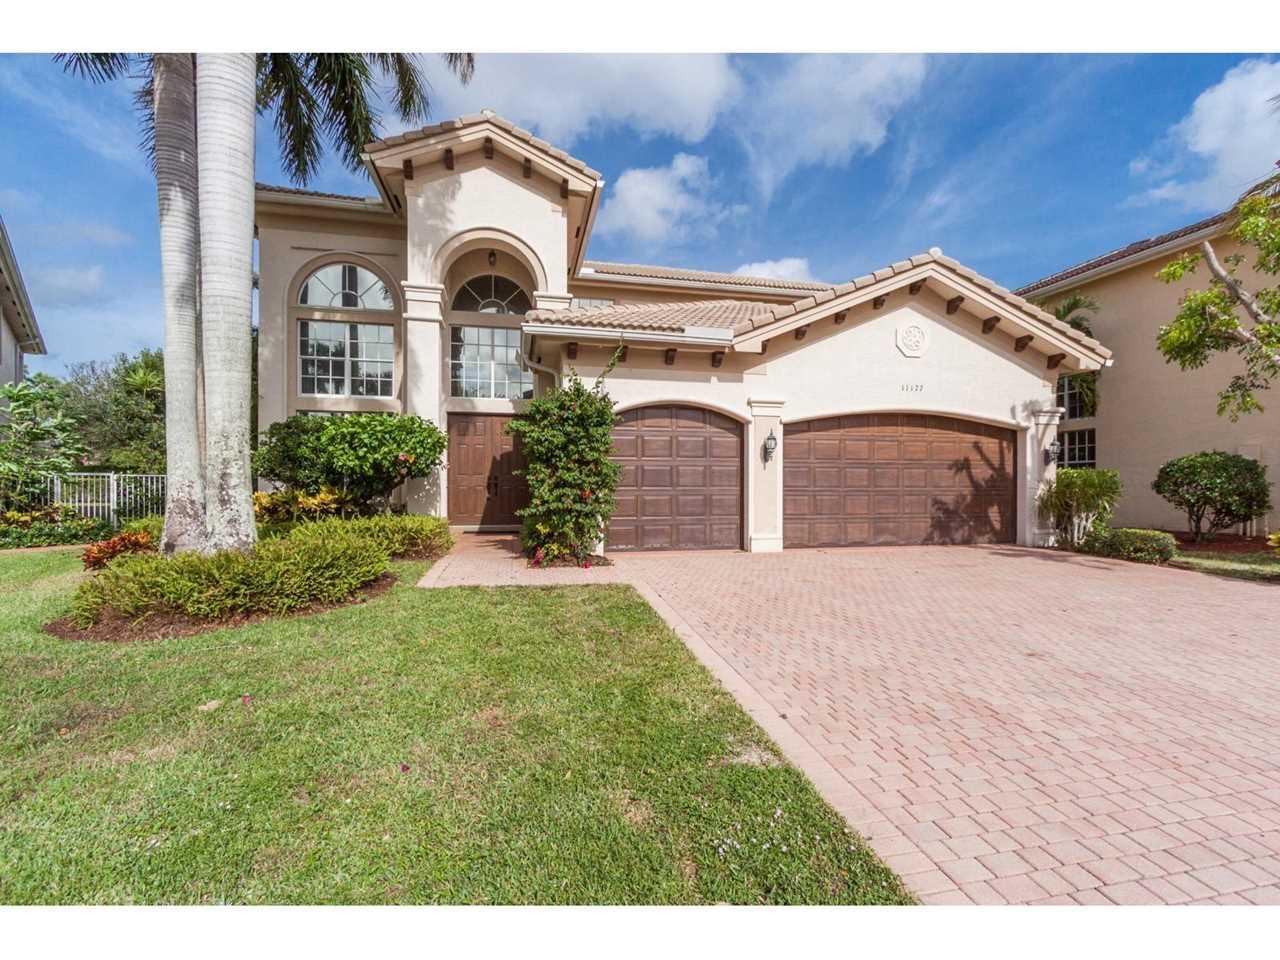 11177 Sunset Ridge Circle Boynton Beach, FL 33473 | MLS RX-10487805 Photo 1